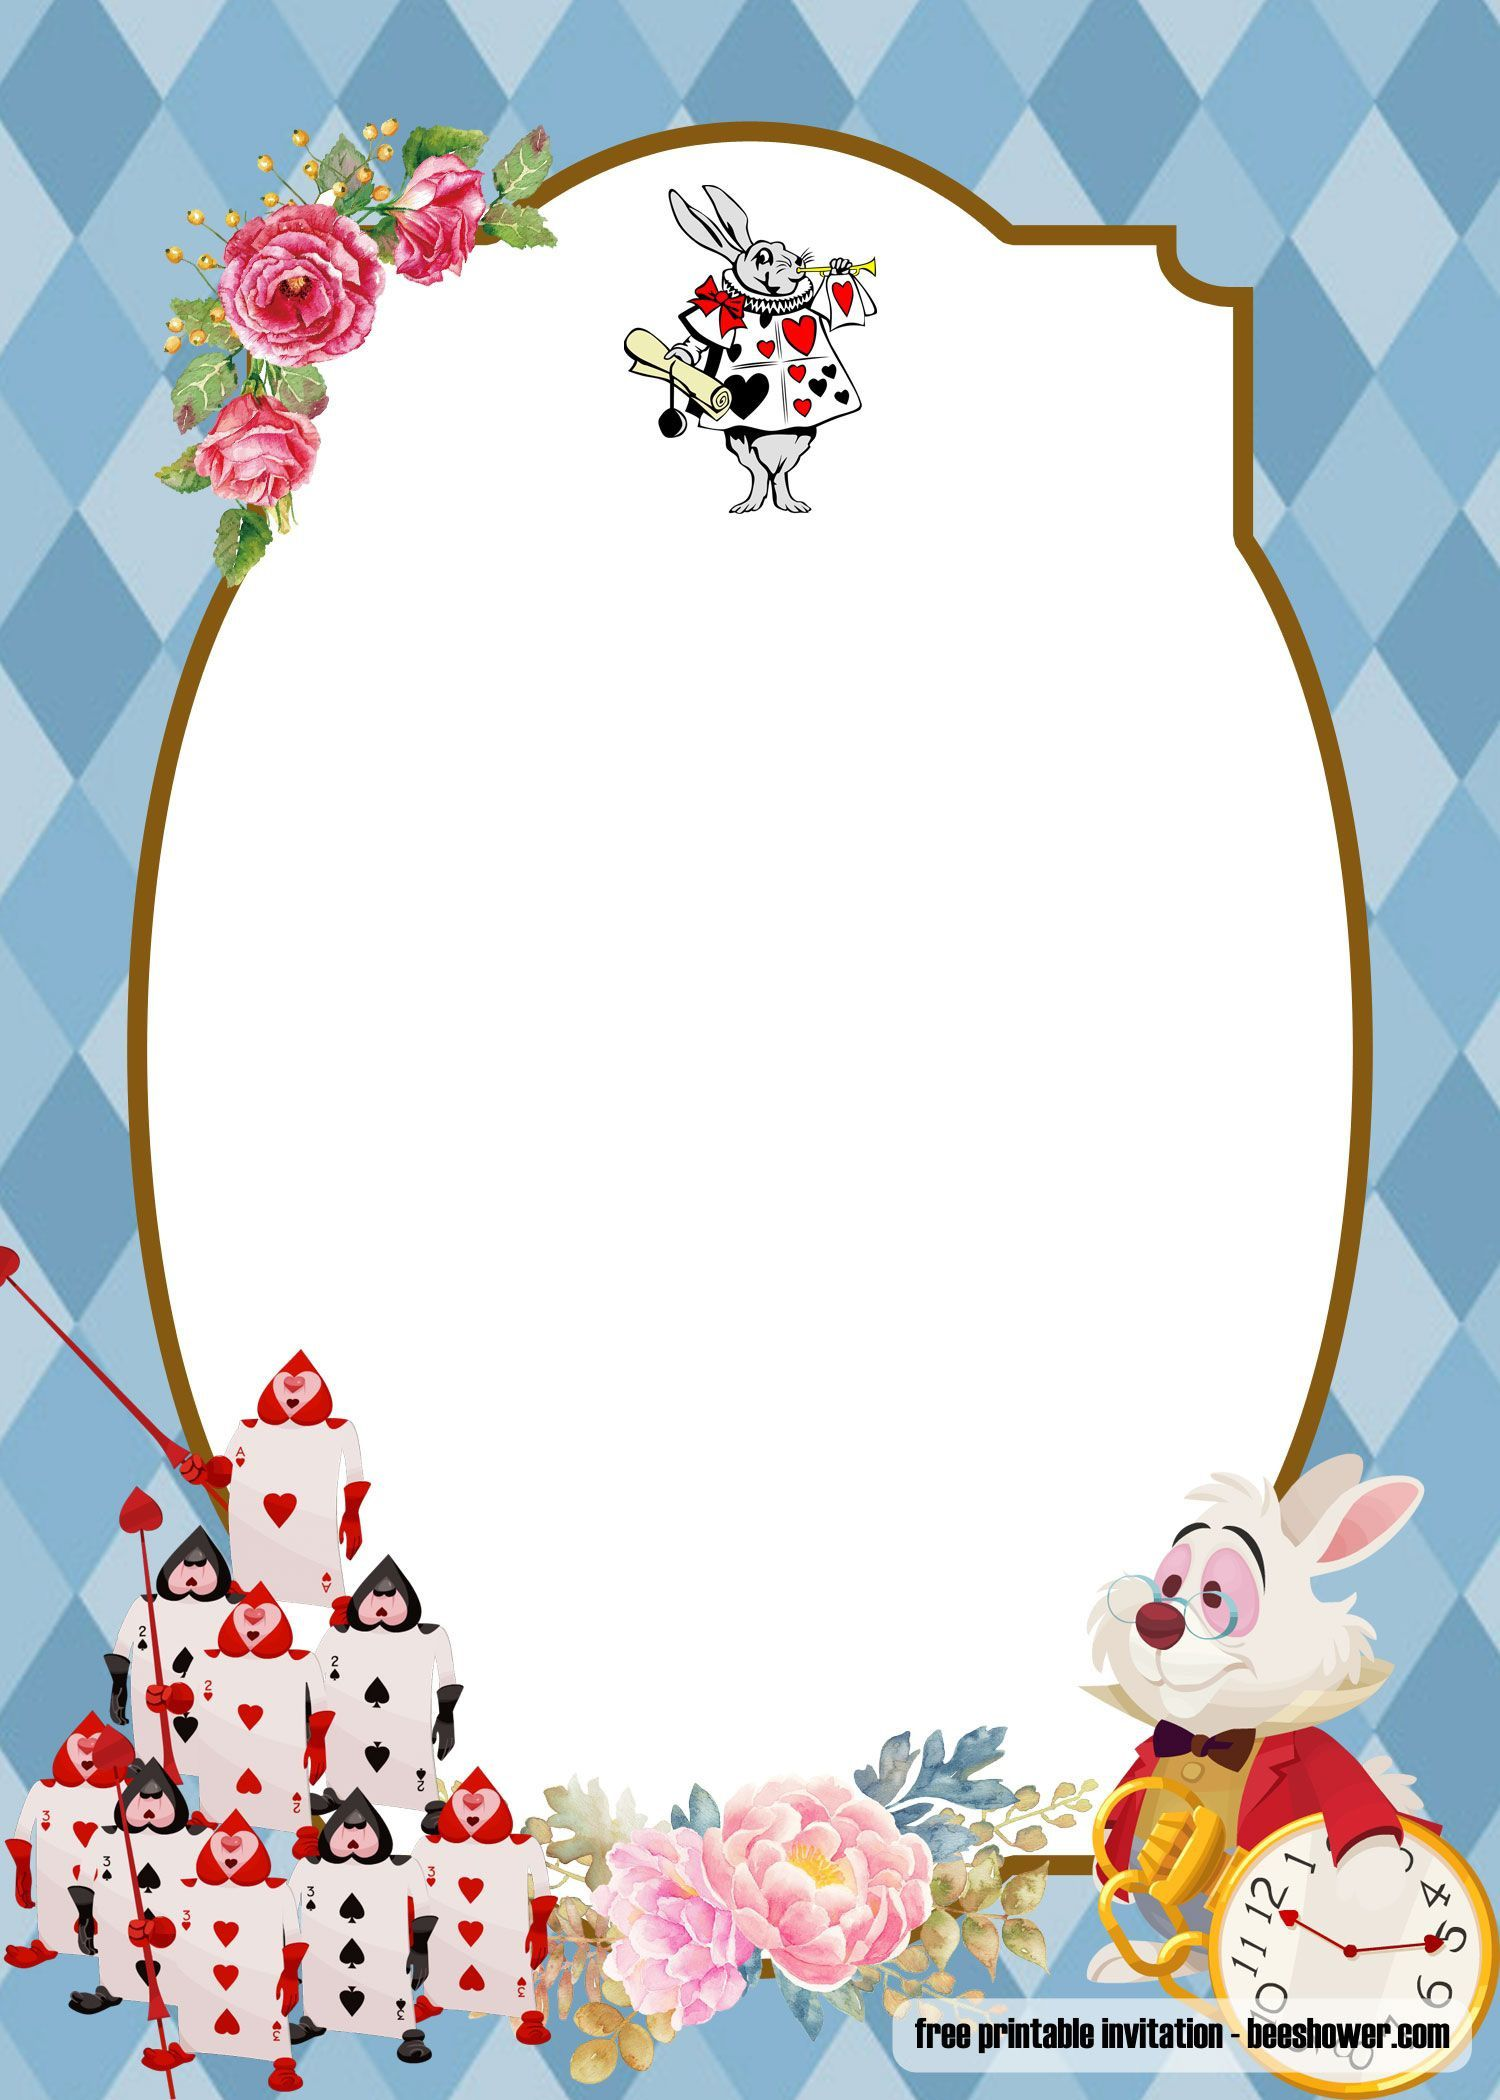 005 Fearsome Alice In Wonderland Tea Party Template Photo  Templates Invitation FreeFull